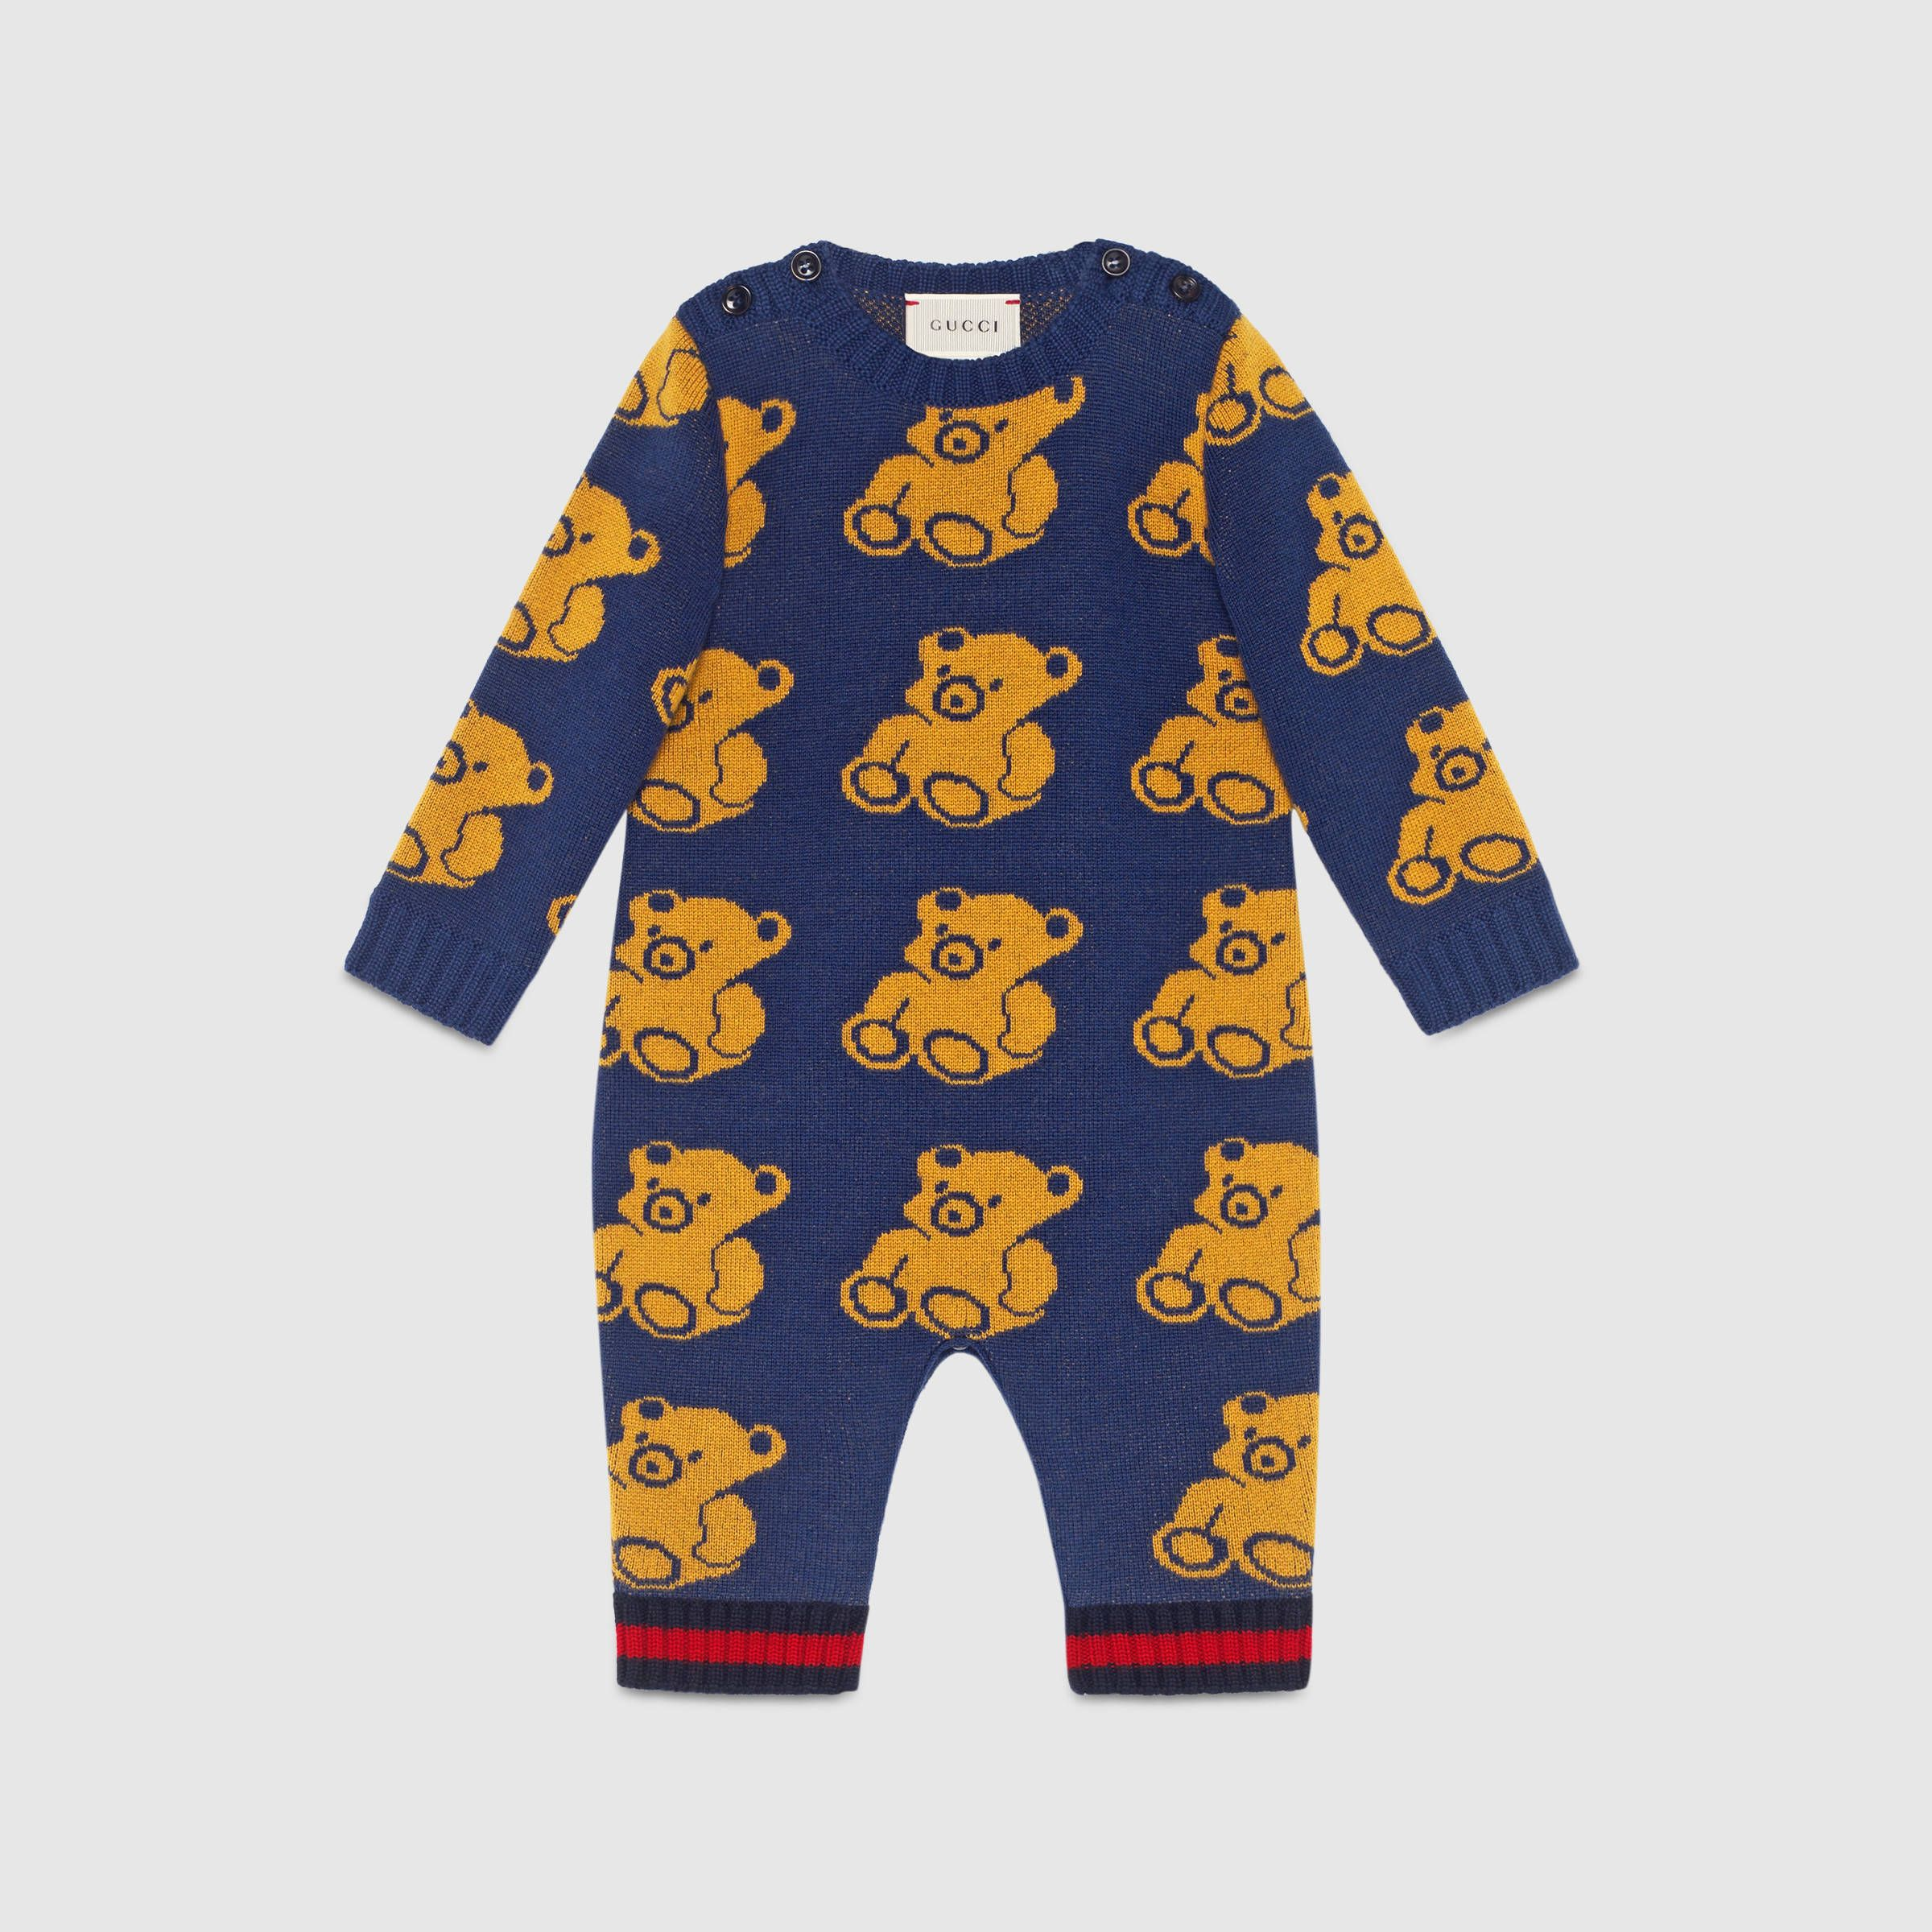 Baby bear jacquard sleepsuit Gucci Newborn Clothing